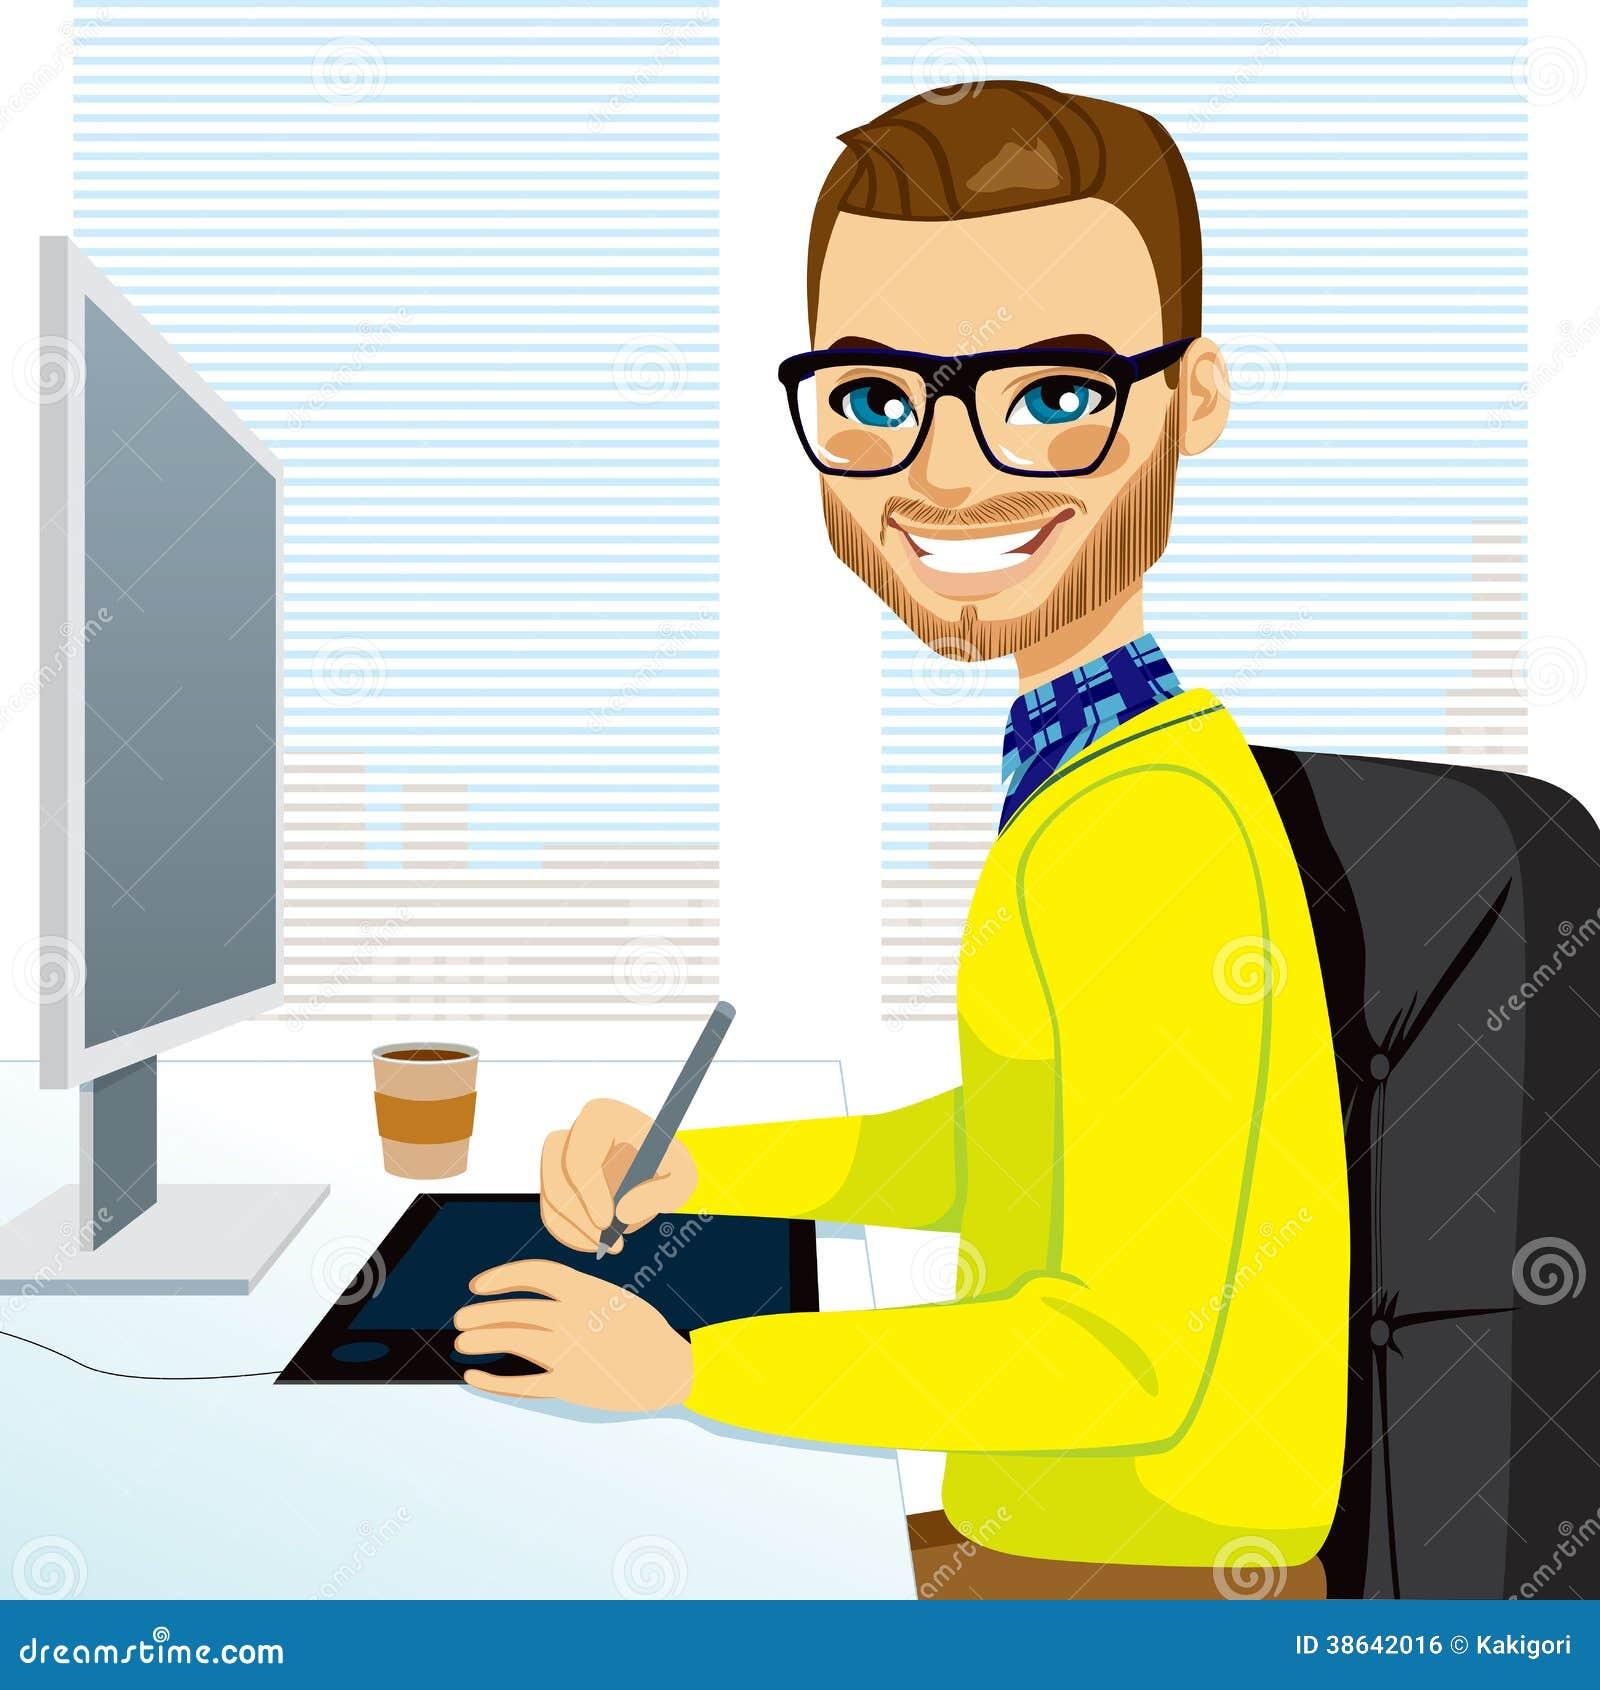 Hipster Graphic Designer Man Working Royalty Free Stock Image Image 38642016